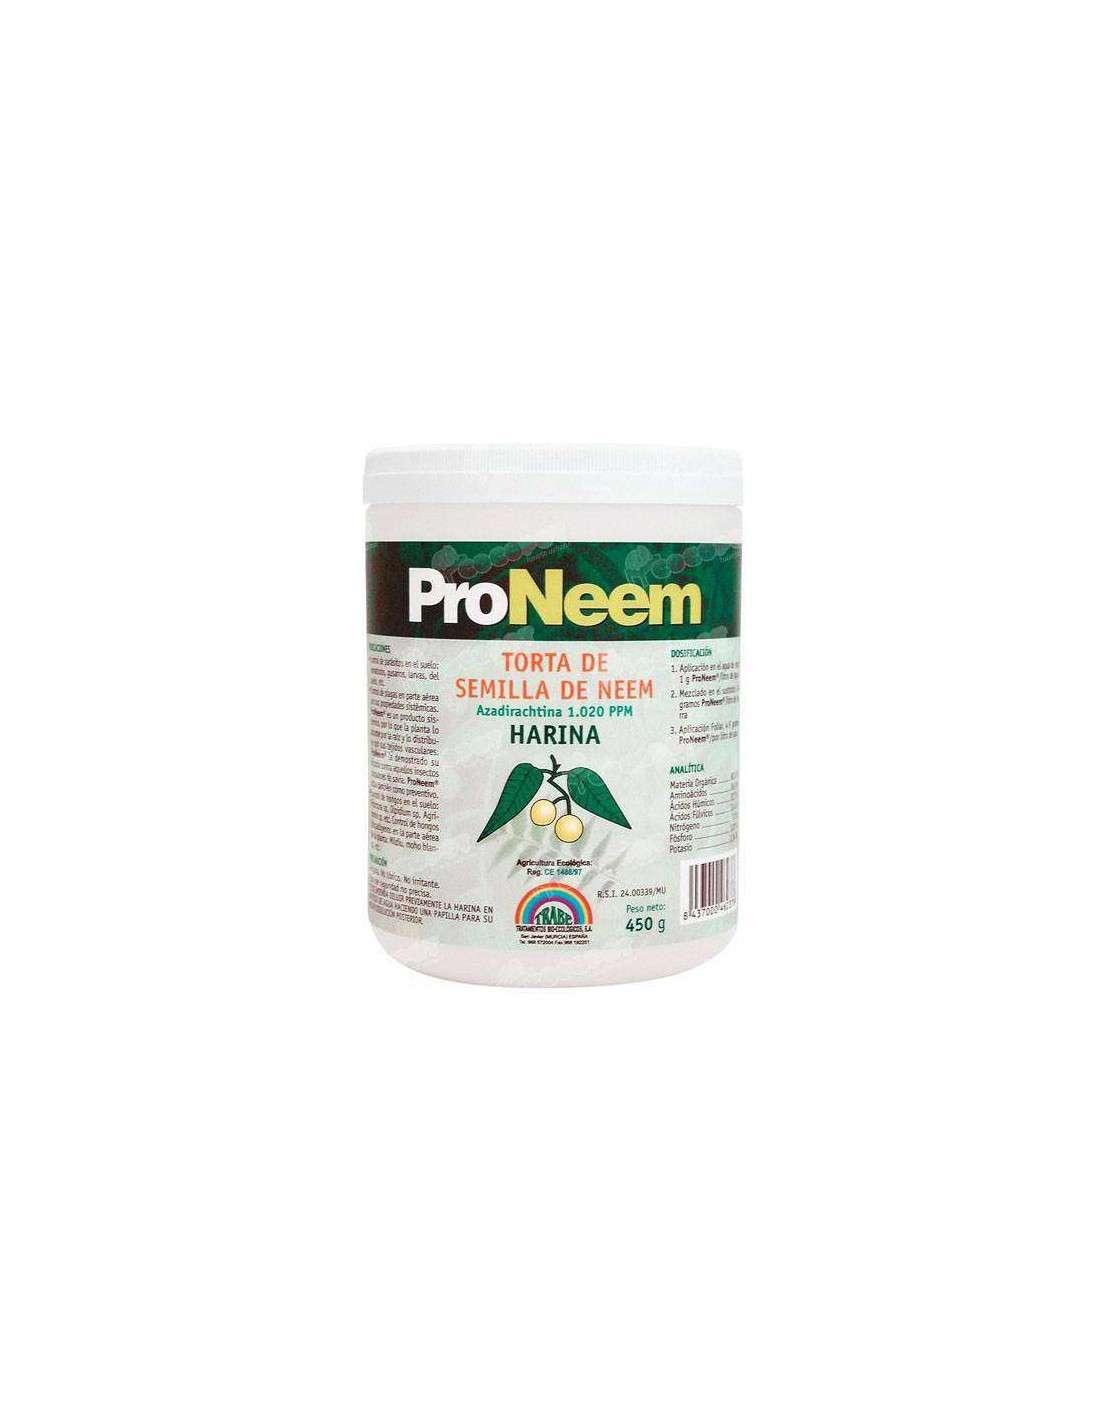 Fungicida Nematicida Ecológico Torta Neem 450g.